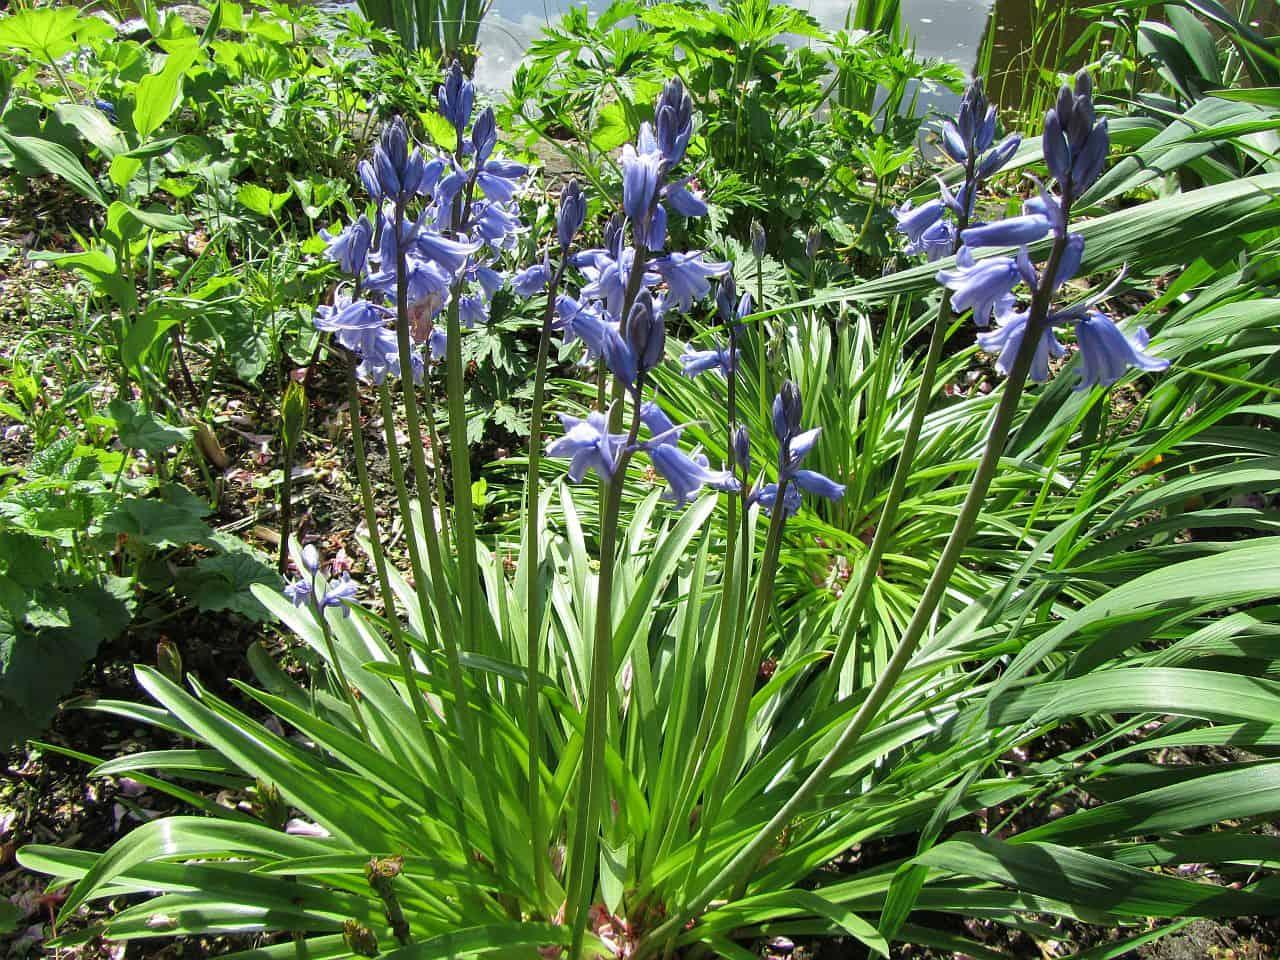 Blaue Bluebells im Beet